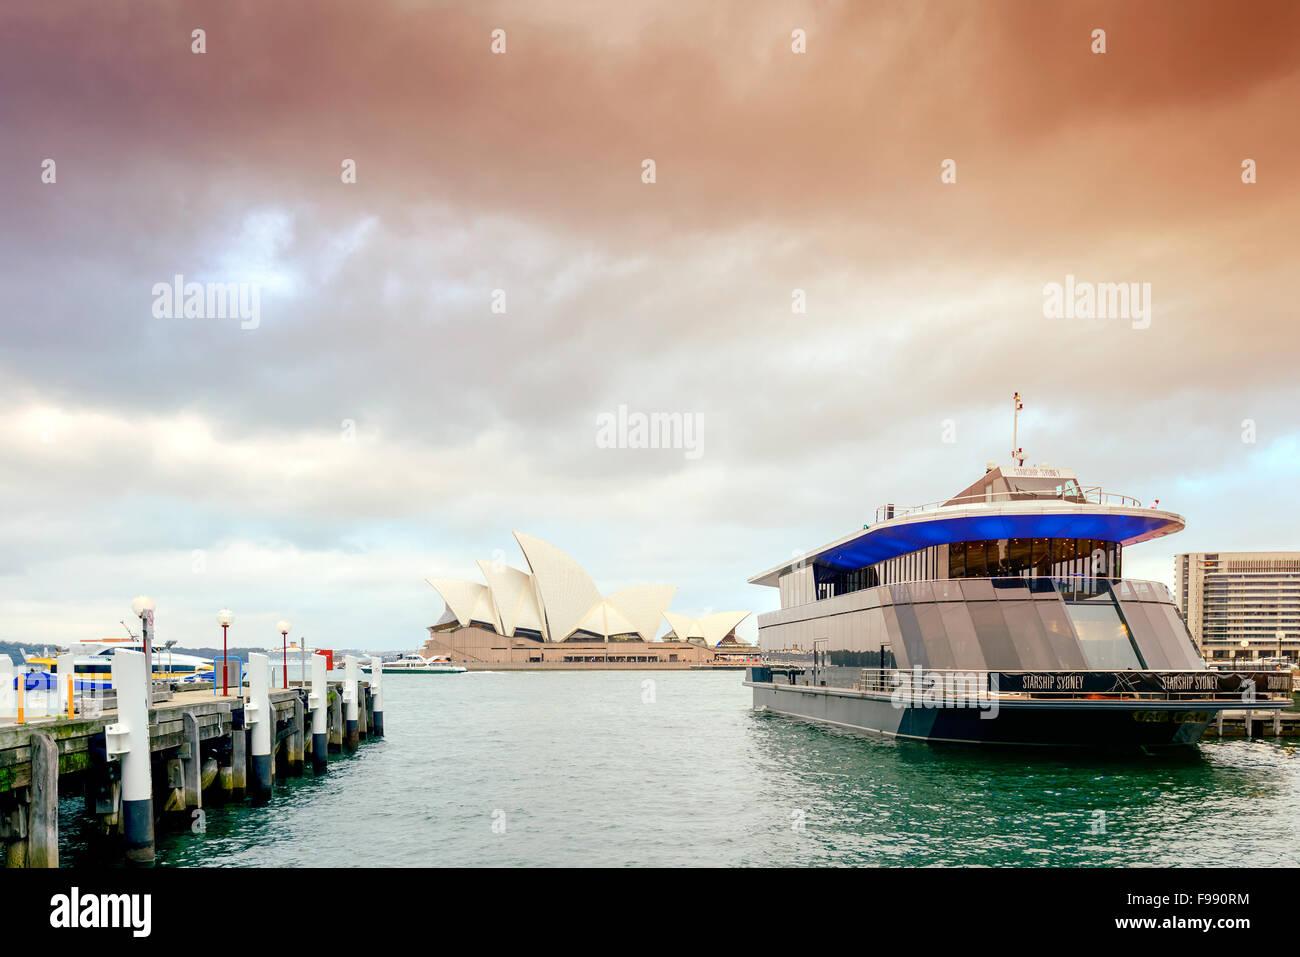 Sydney, Australia - November 7, 2015: Starship Sydney docked in Sydney Cove and ready to depart for the wedding - Stock Image